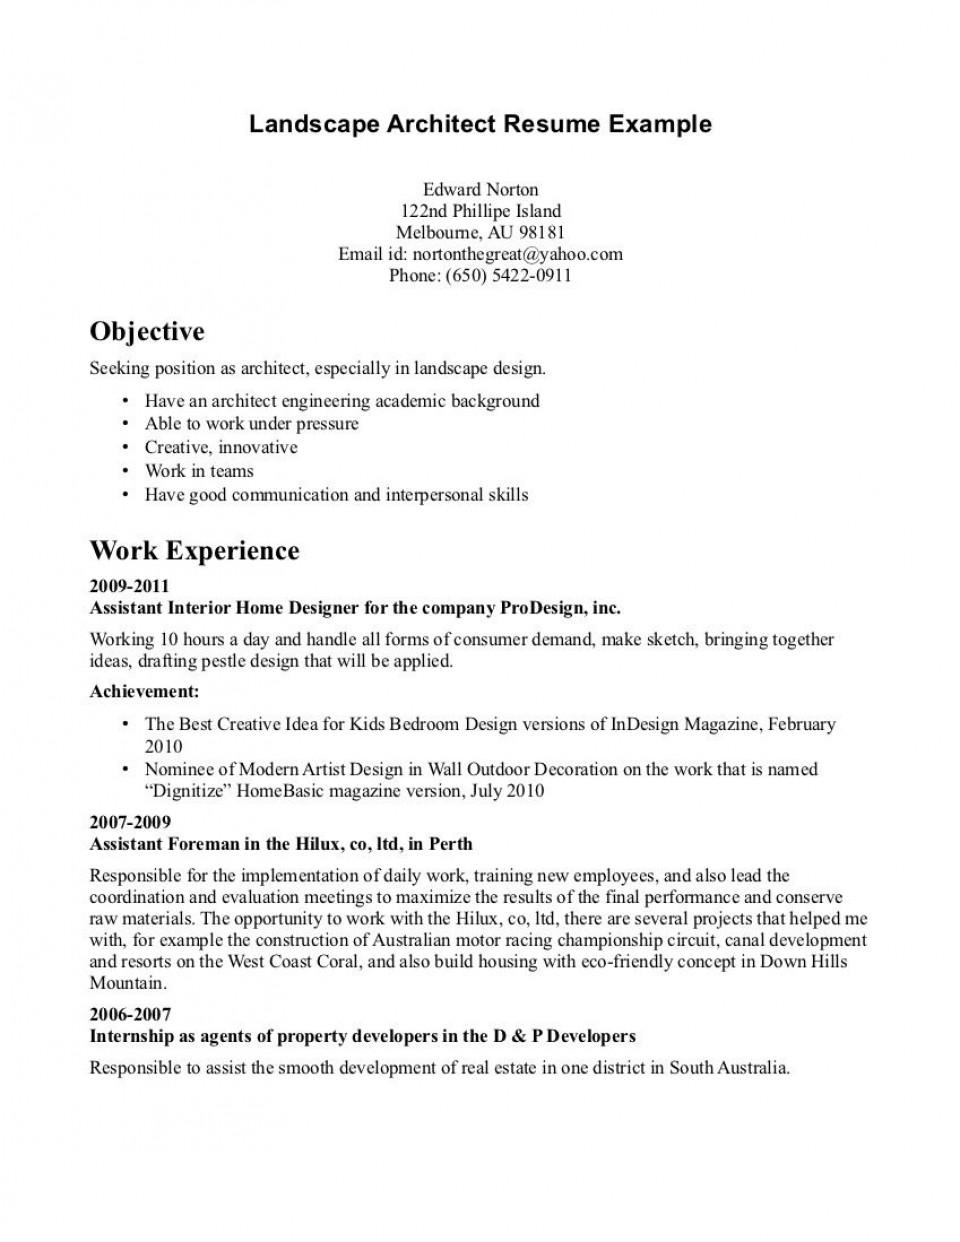 008 Essay Example Landscape Stunning Architecture Argumentative Topics 960